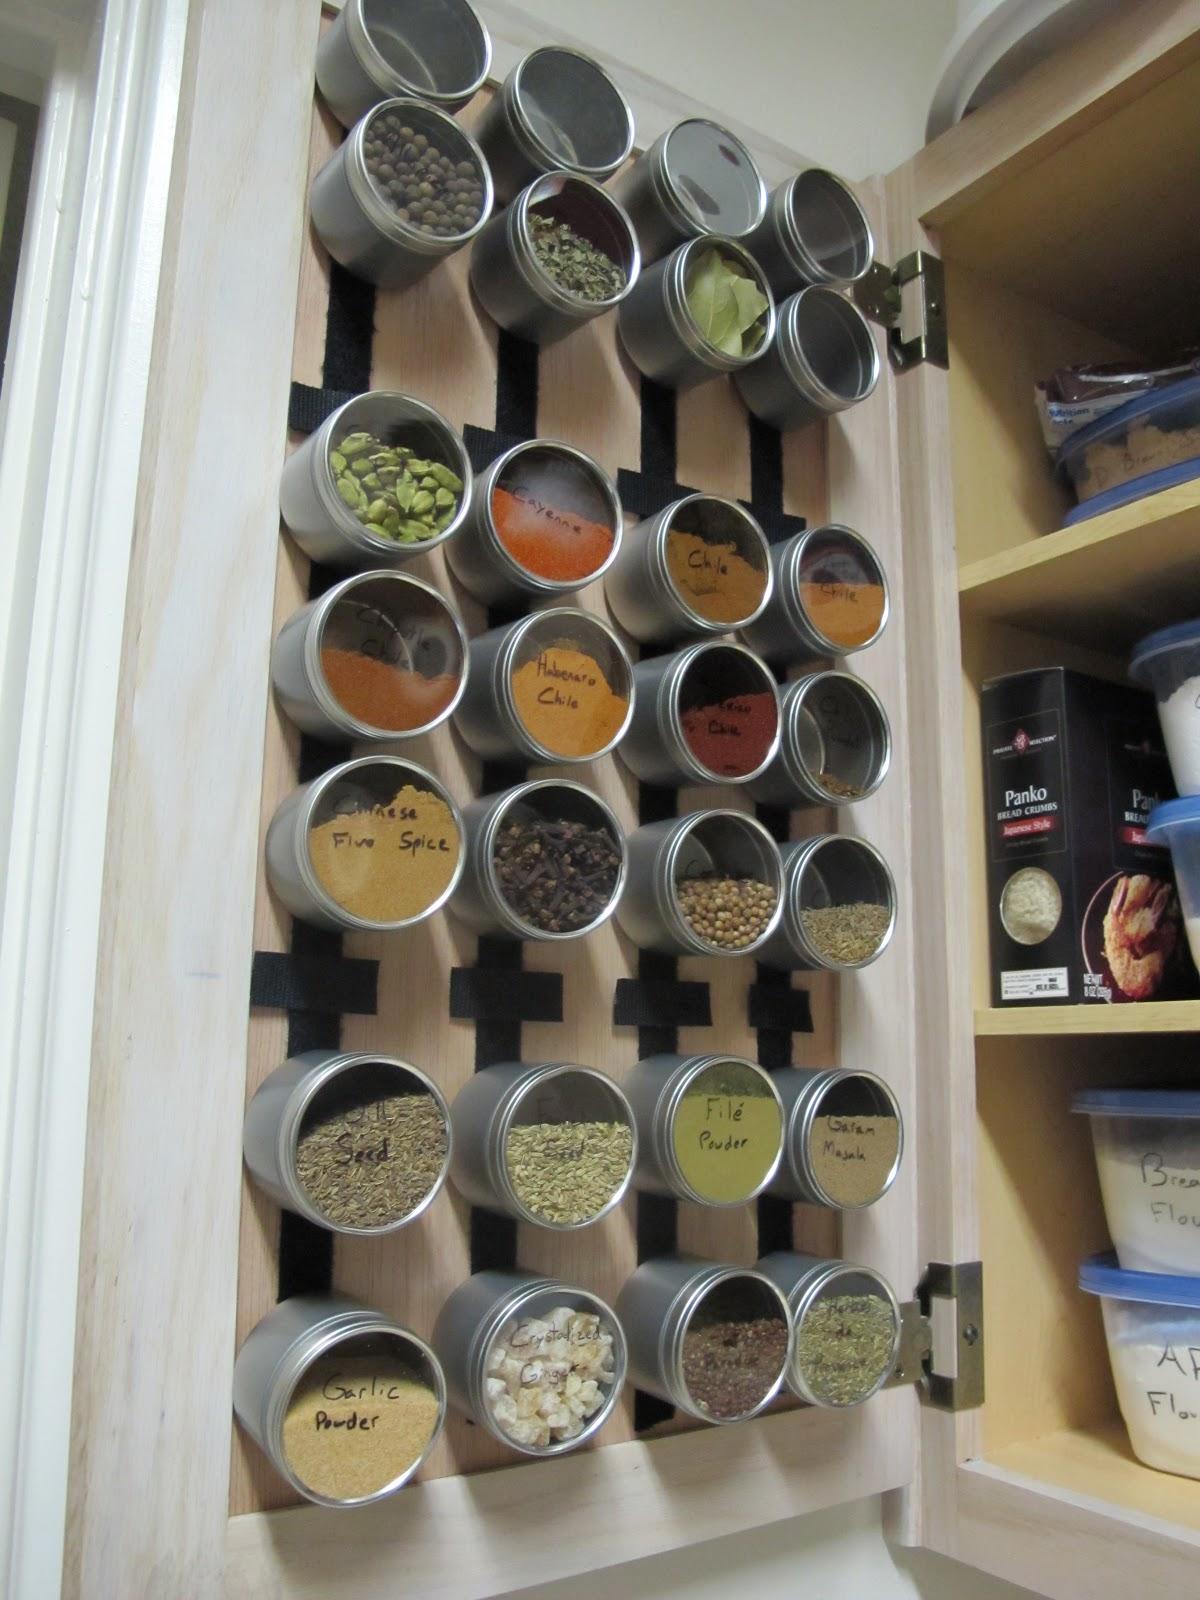 Ikea Cupboard Organizer The Ramblings Of Chuck Howard Mission Spice Rack